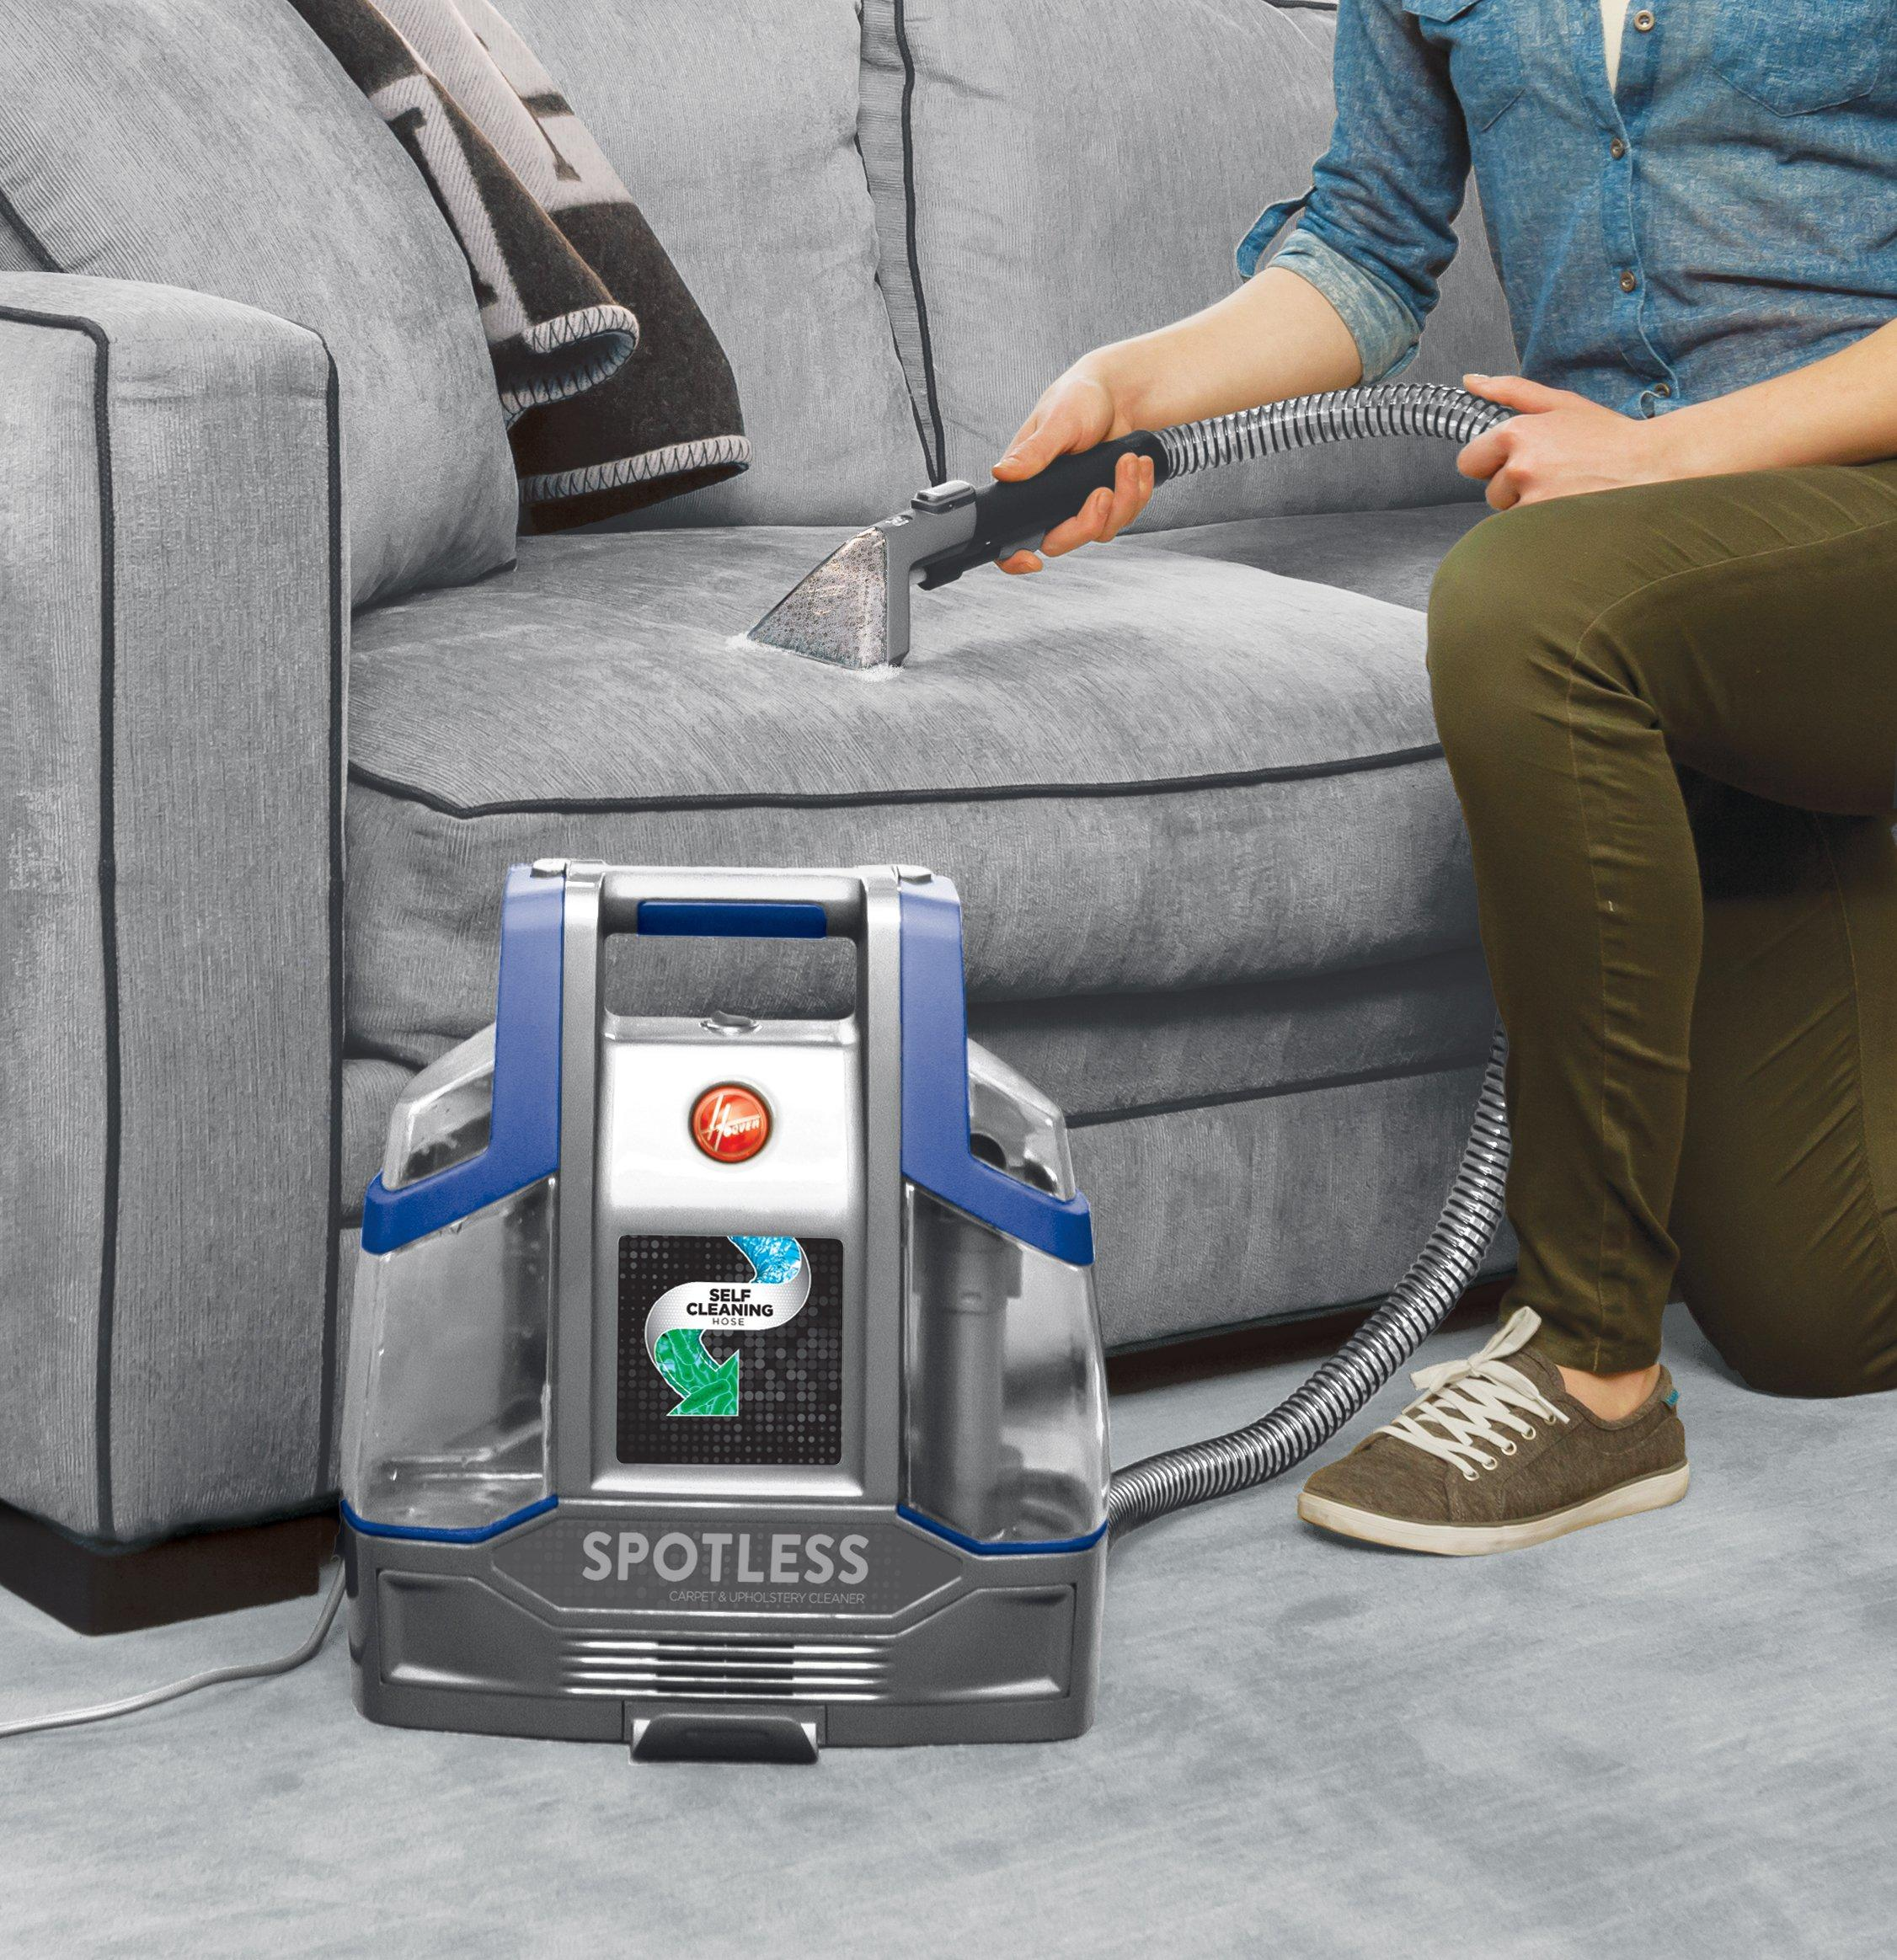 Spotless Deluxe Portable Carpet & Upholstery Cleaner3